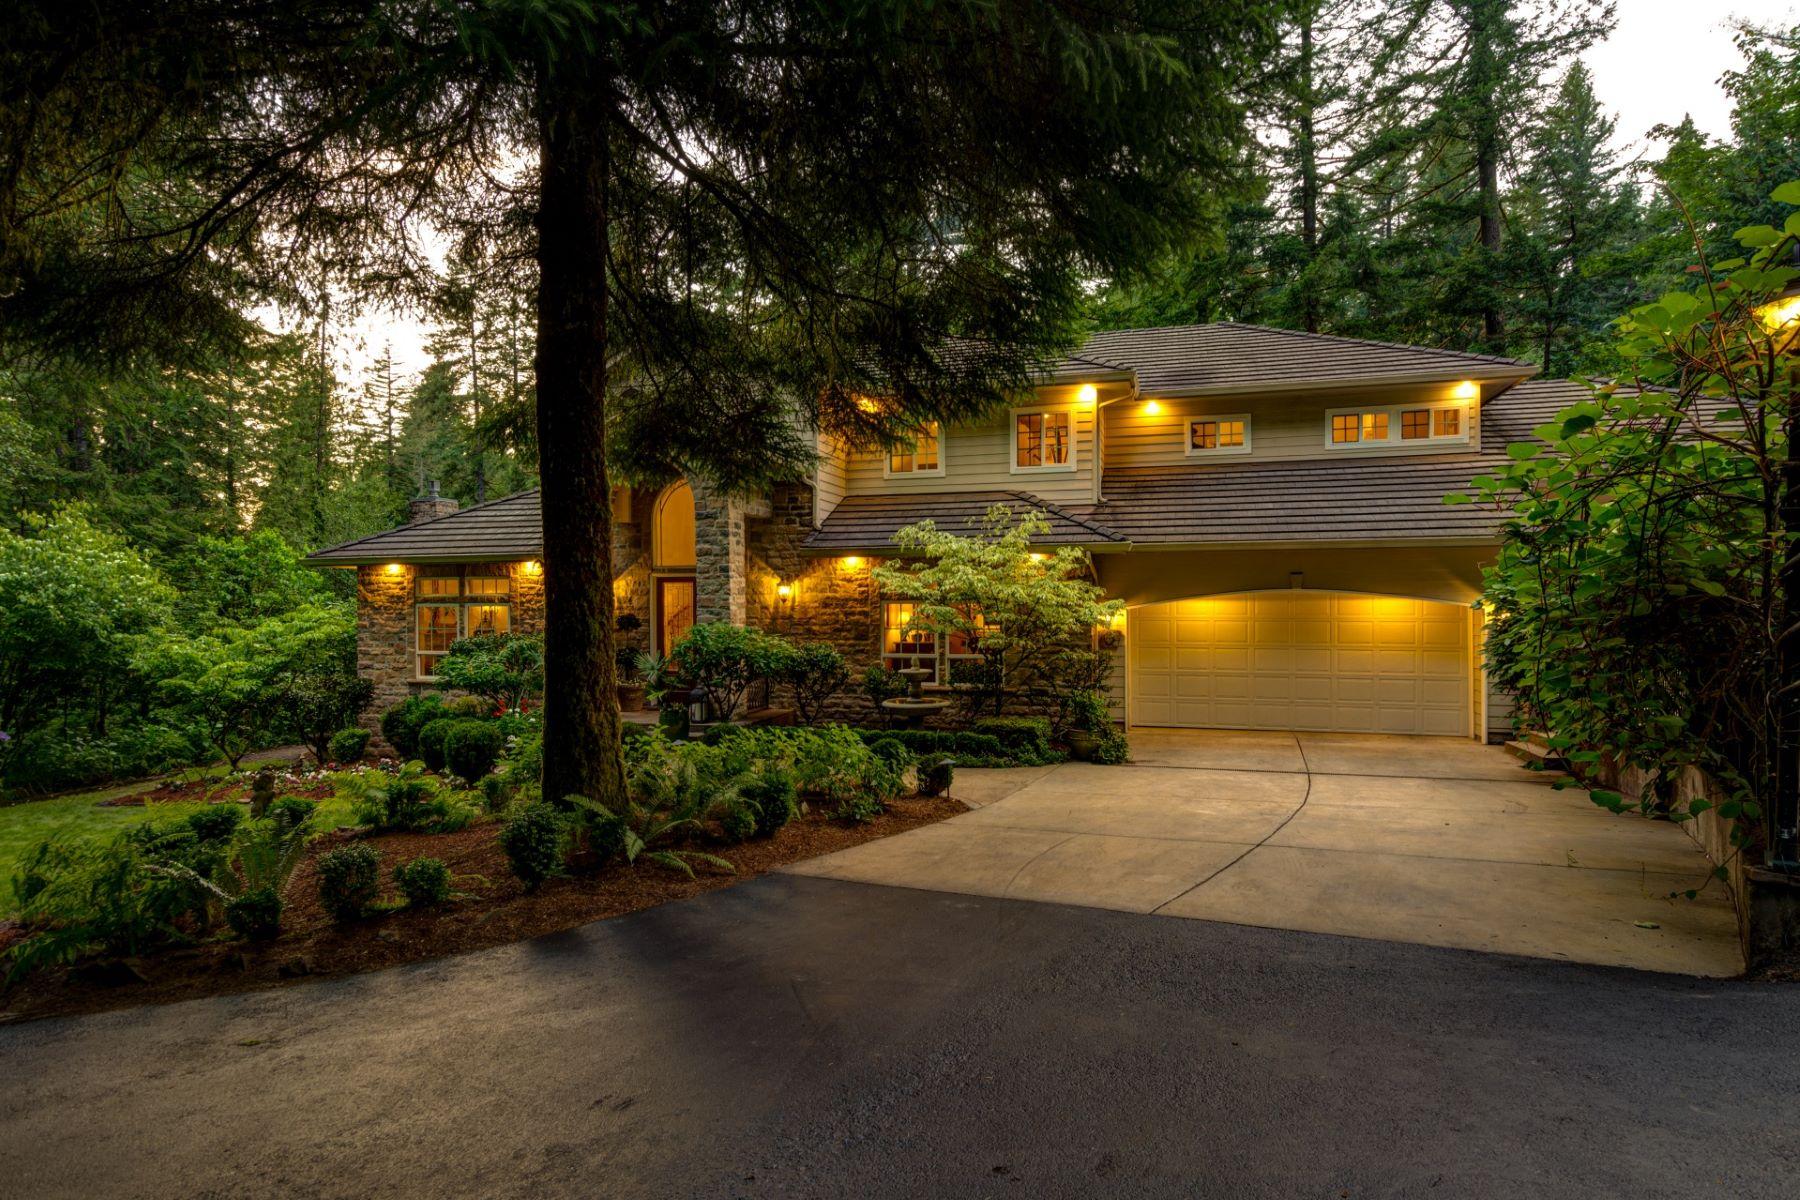 Single Family Homes for Sale at Luxury Riverfront Escape 29903 NE Hantwick Road Yacolt, Washington 98675 United States